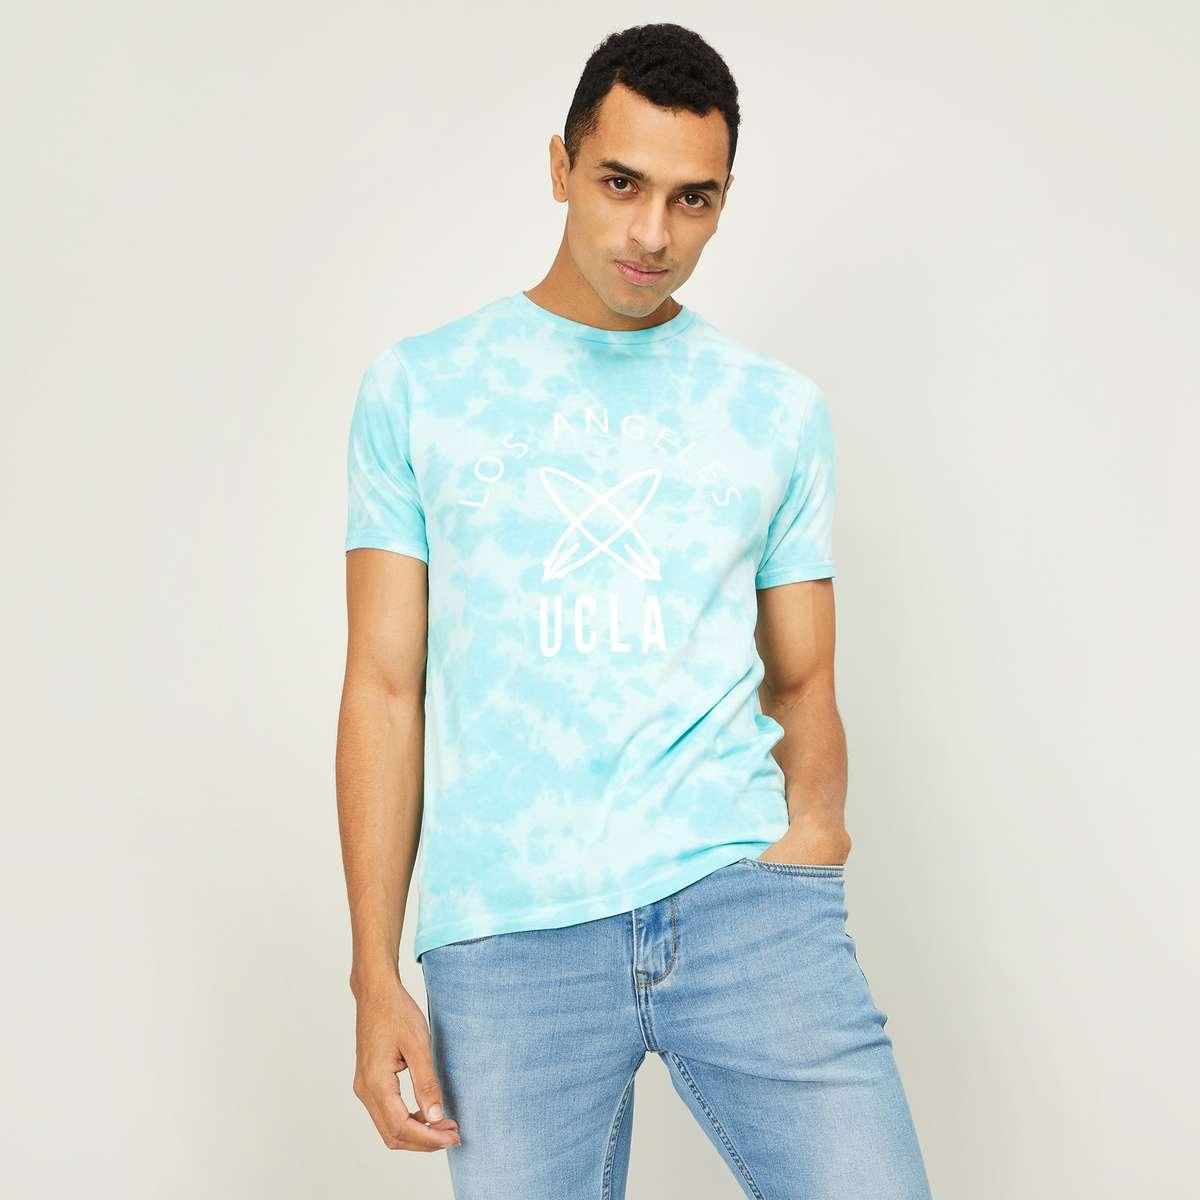 4.UCLA Men Printed Crew Neck T-Shirt